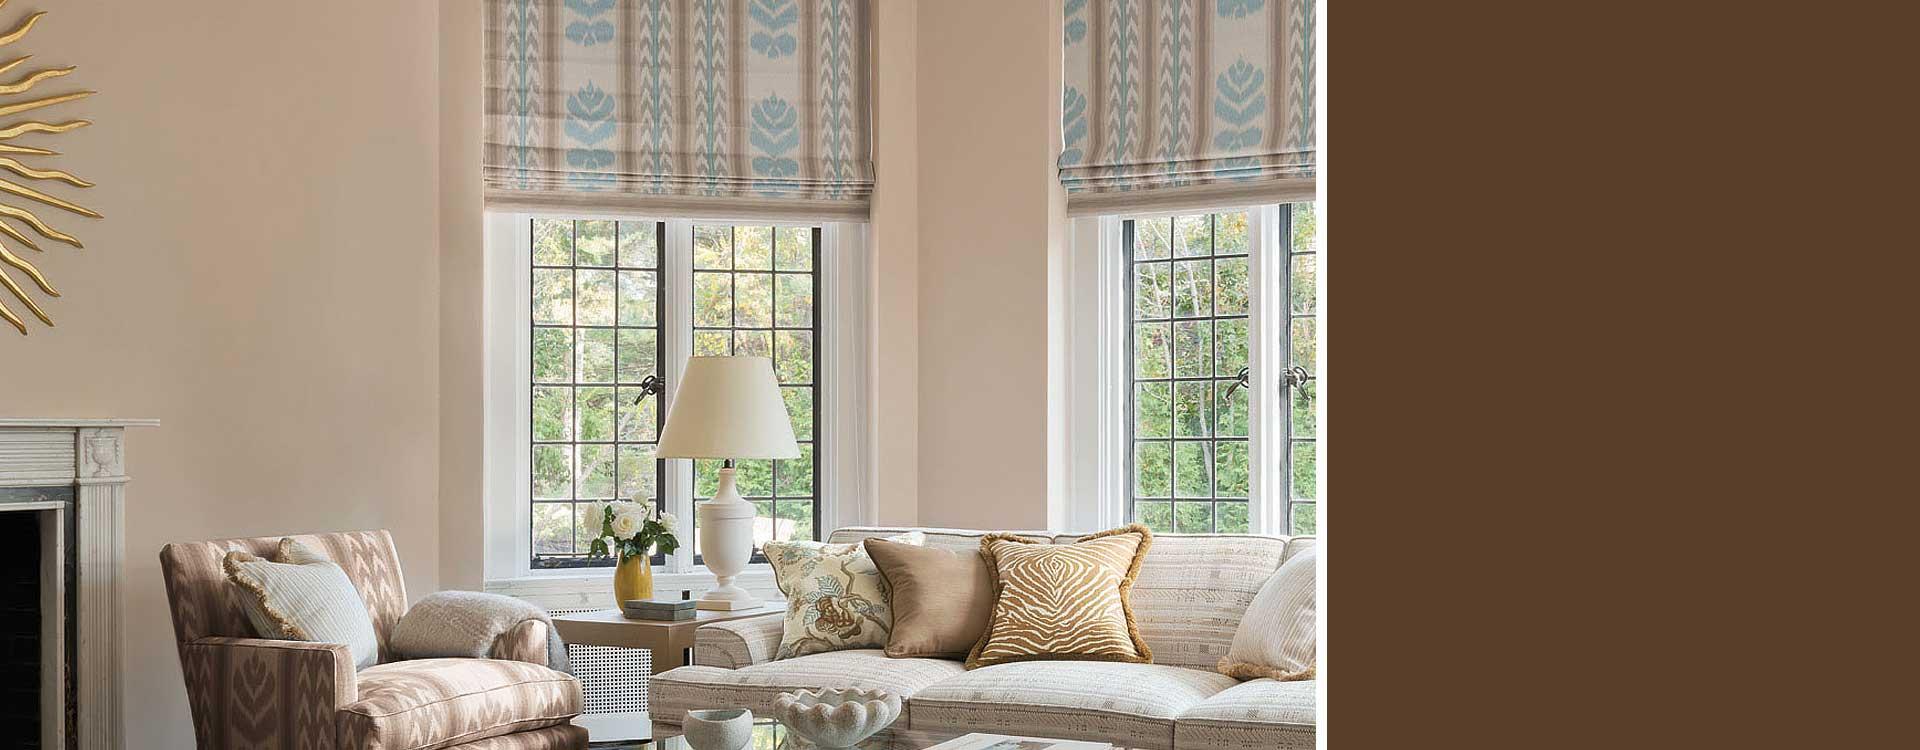 custom valances online drapes roman shades direct regal drapes. Black Bedroom Furniture Sets. Home Design Ideas